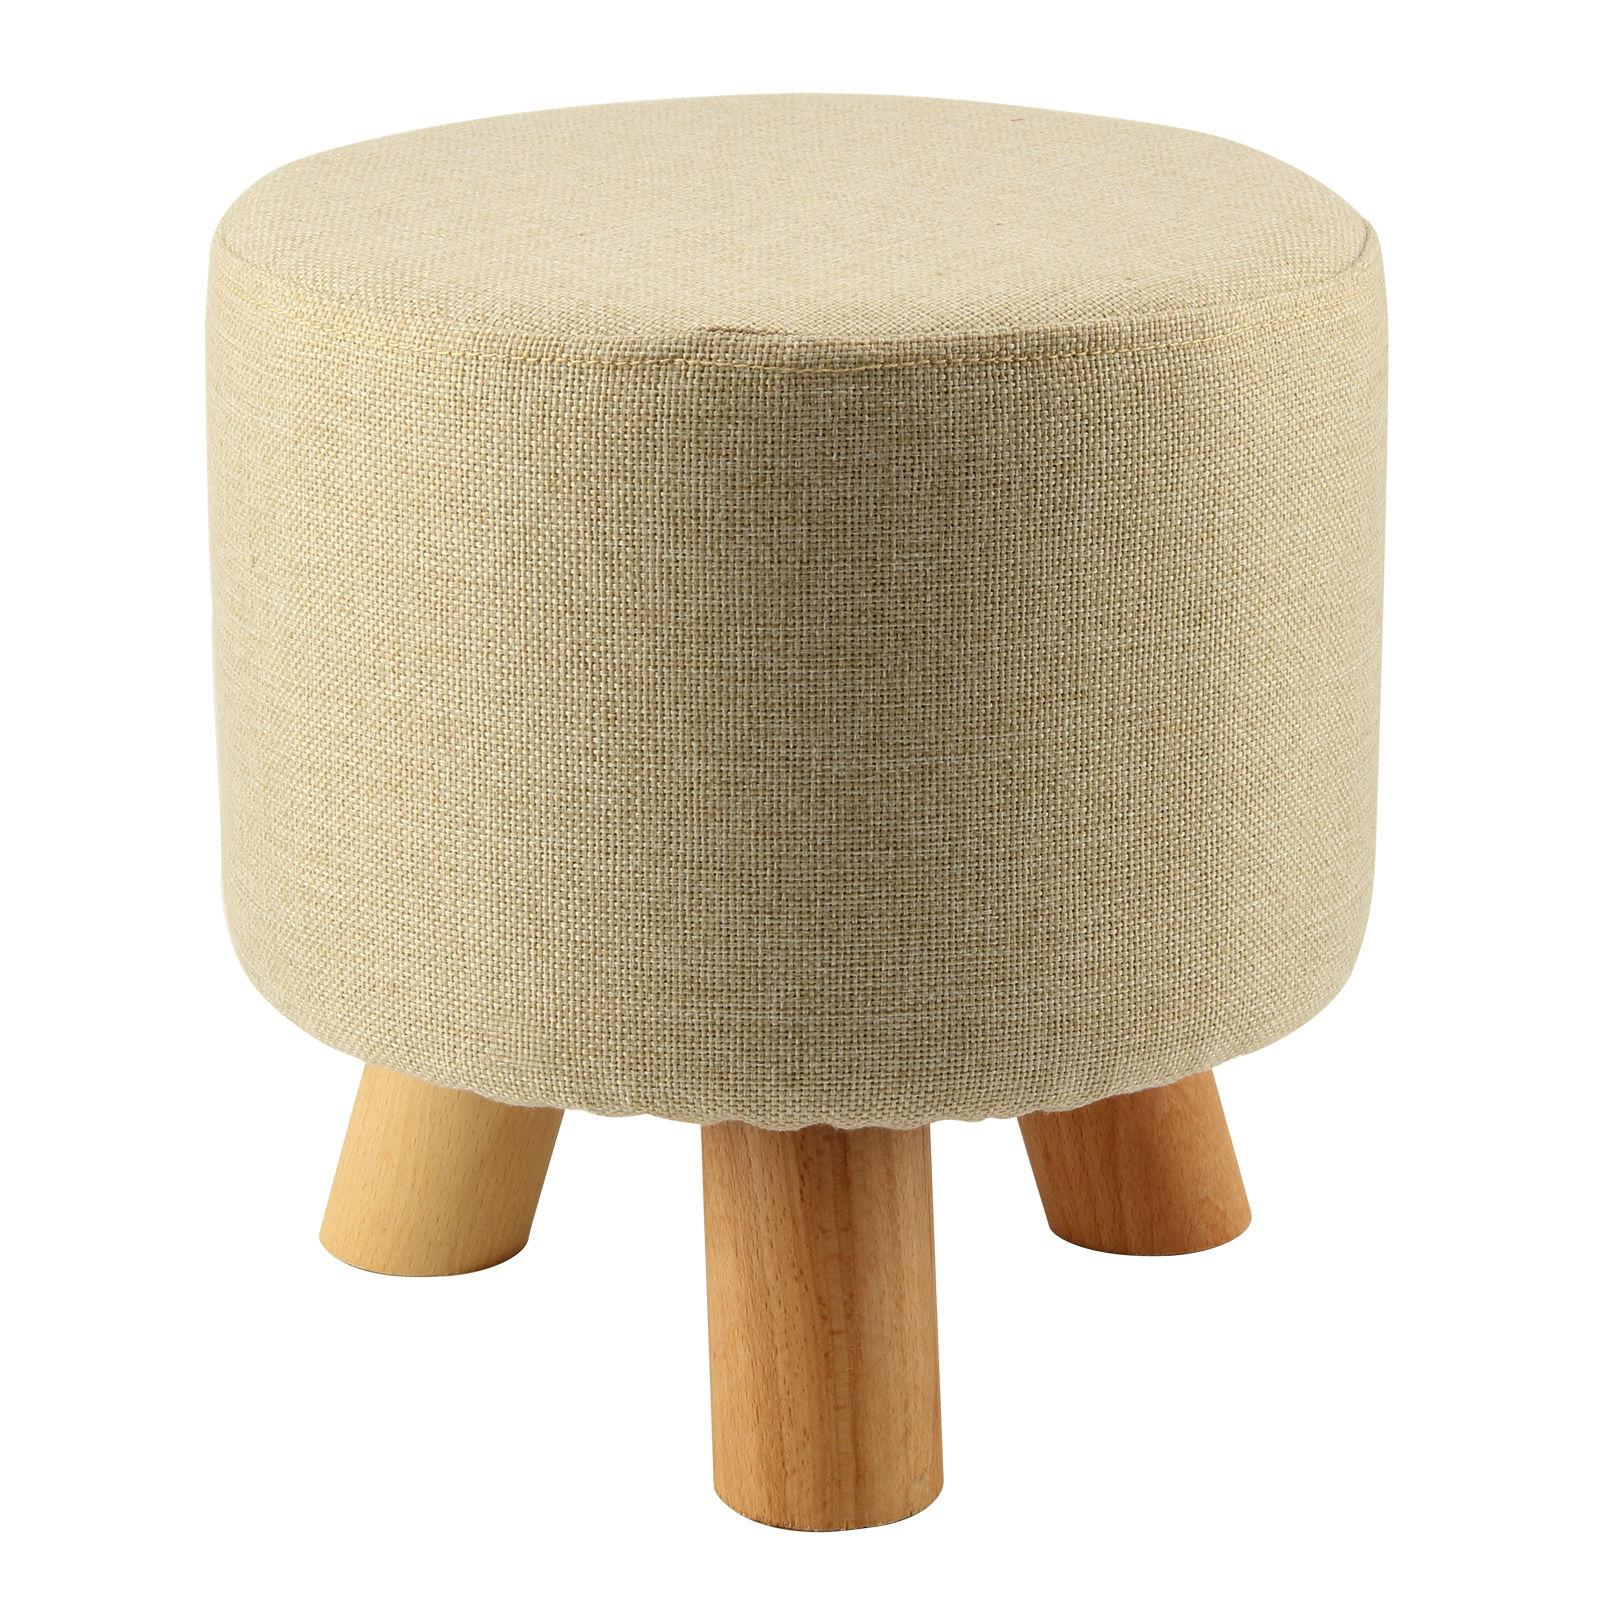 popular round fabric ottomanbuy cheap round fabric ottoman lots  - modern luxury upholstered footstool round pouffe stool  wooden leg pattern round fabricgrey